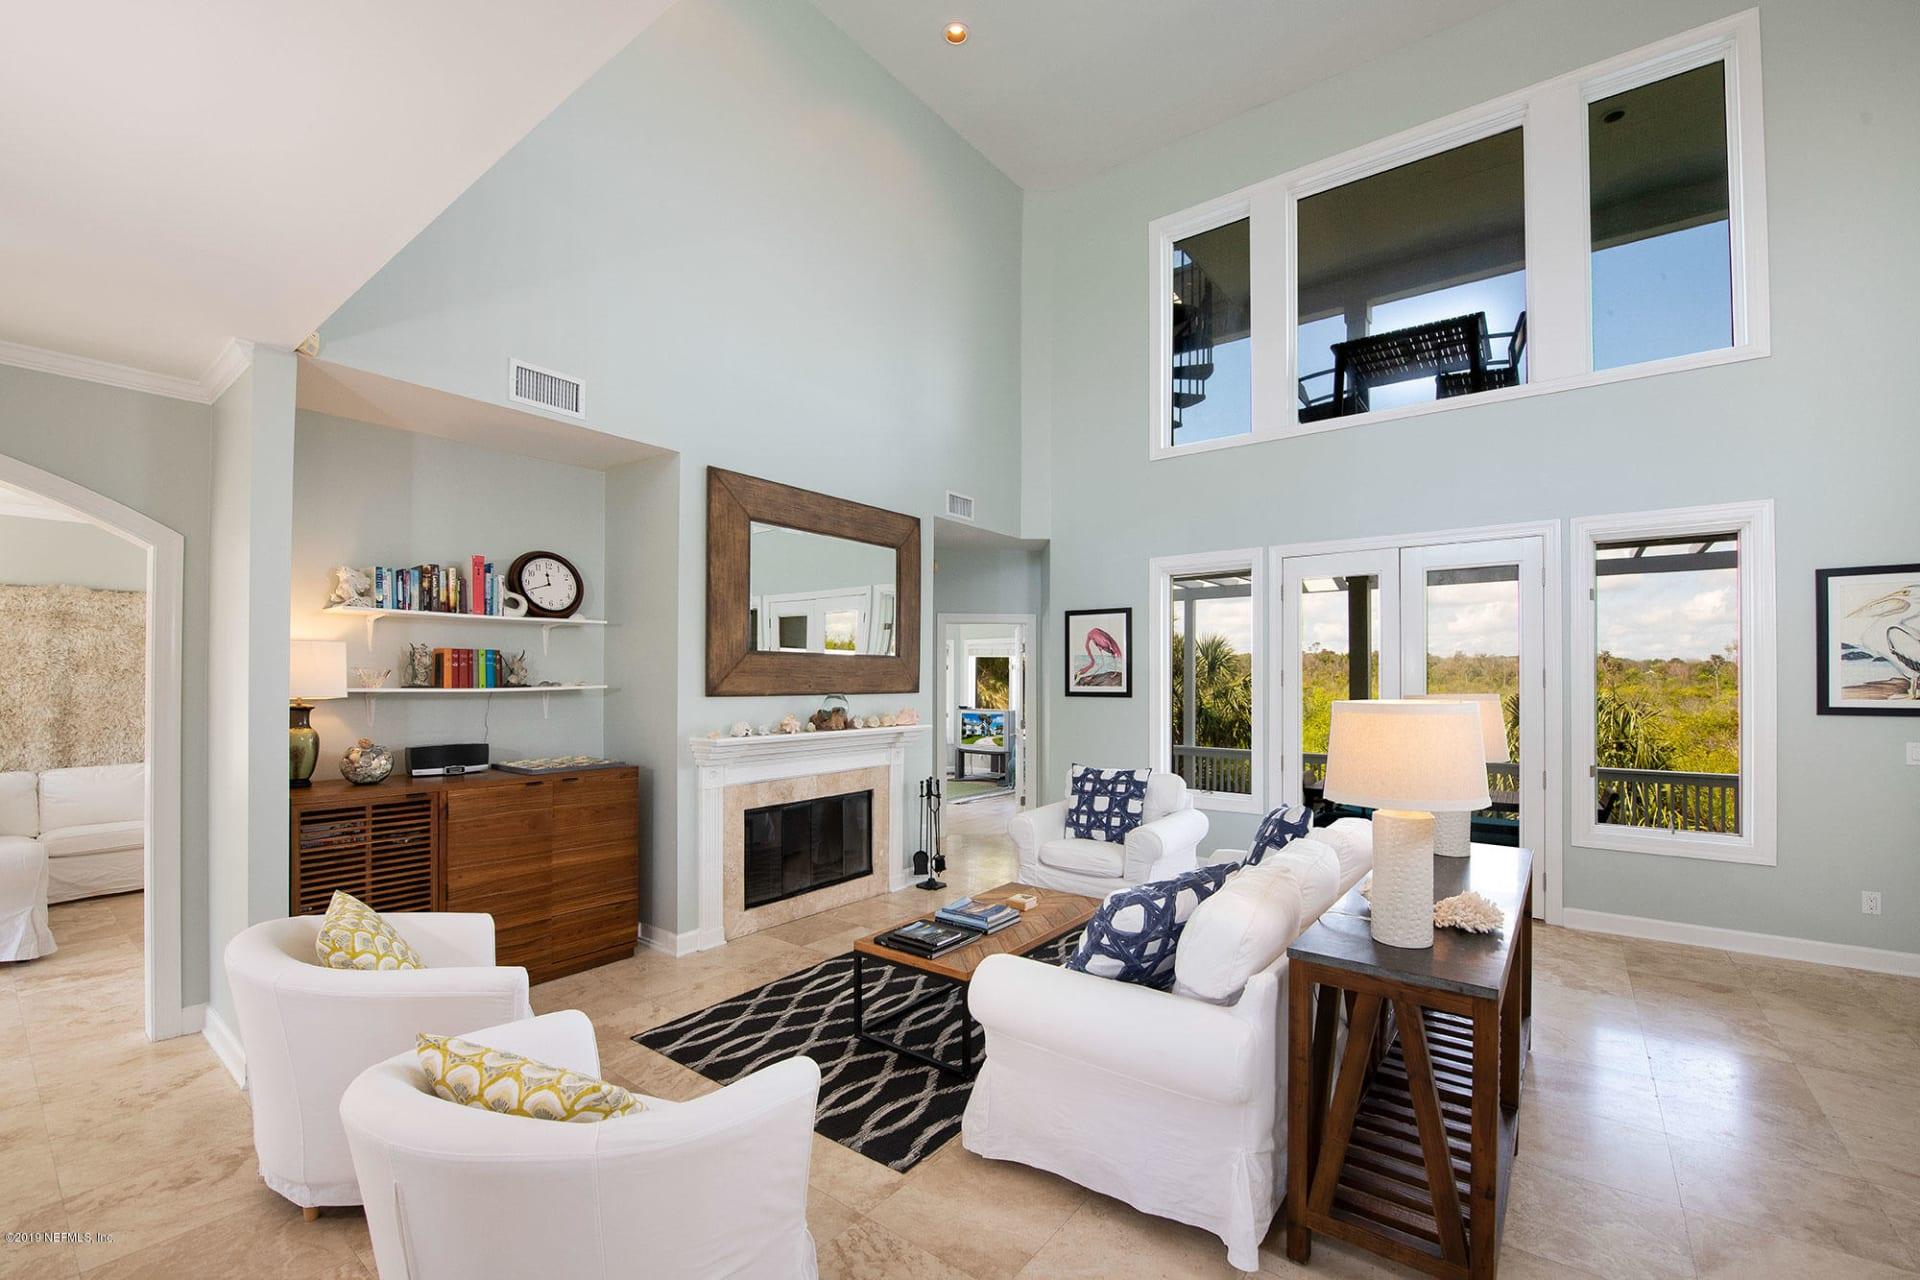 Is First Coast Housing Hitting a Plateau?